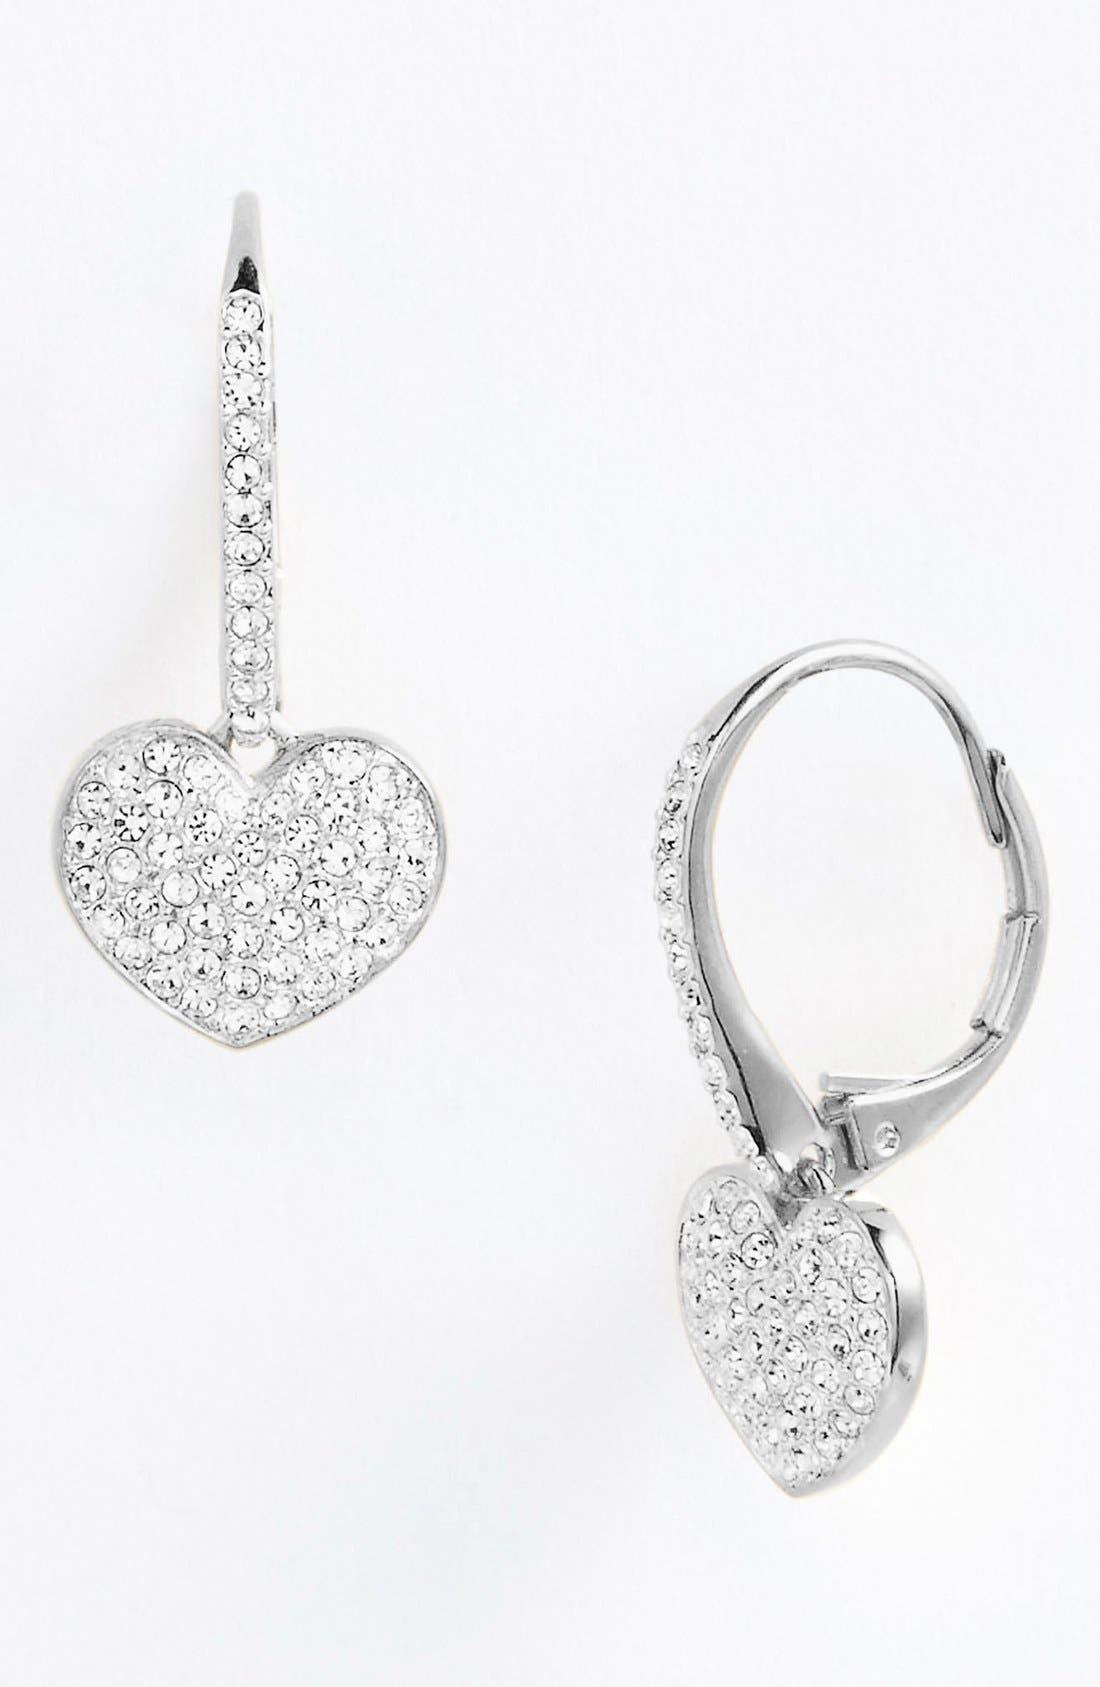 Main Image - Nadri 'Charmers' Pavé Symbol Drop Earrings (Nordstrom Exclusive)